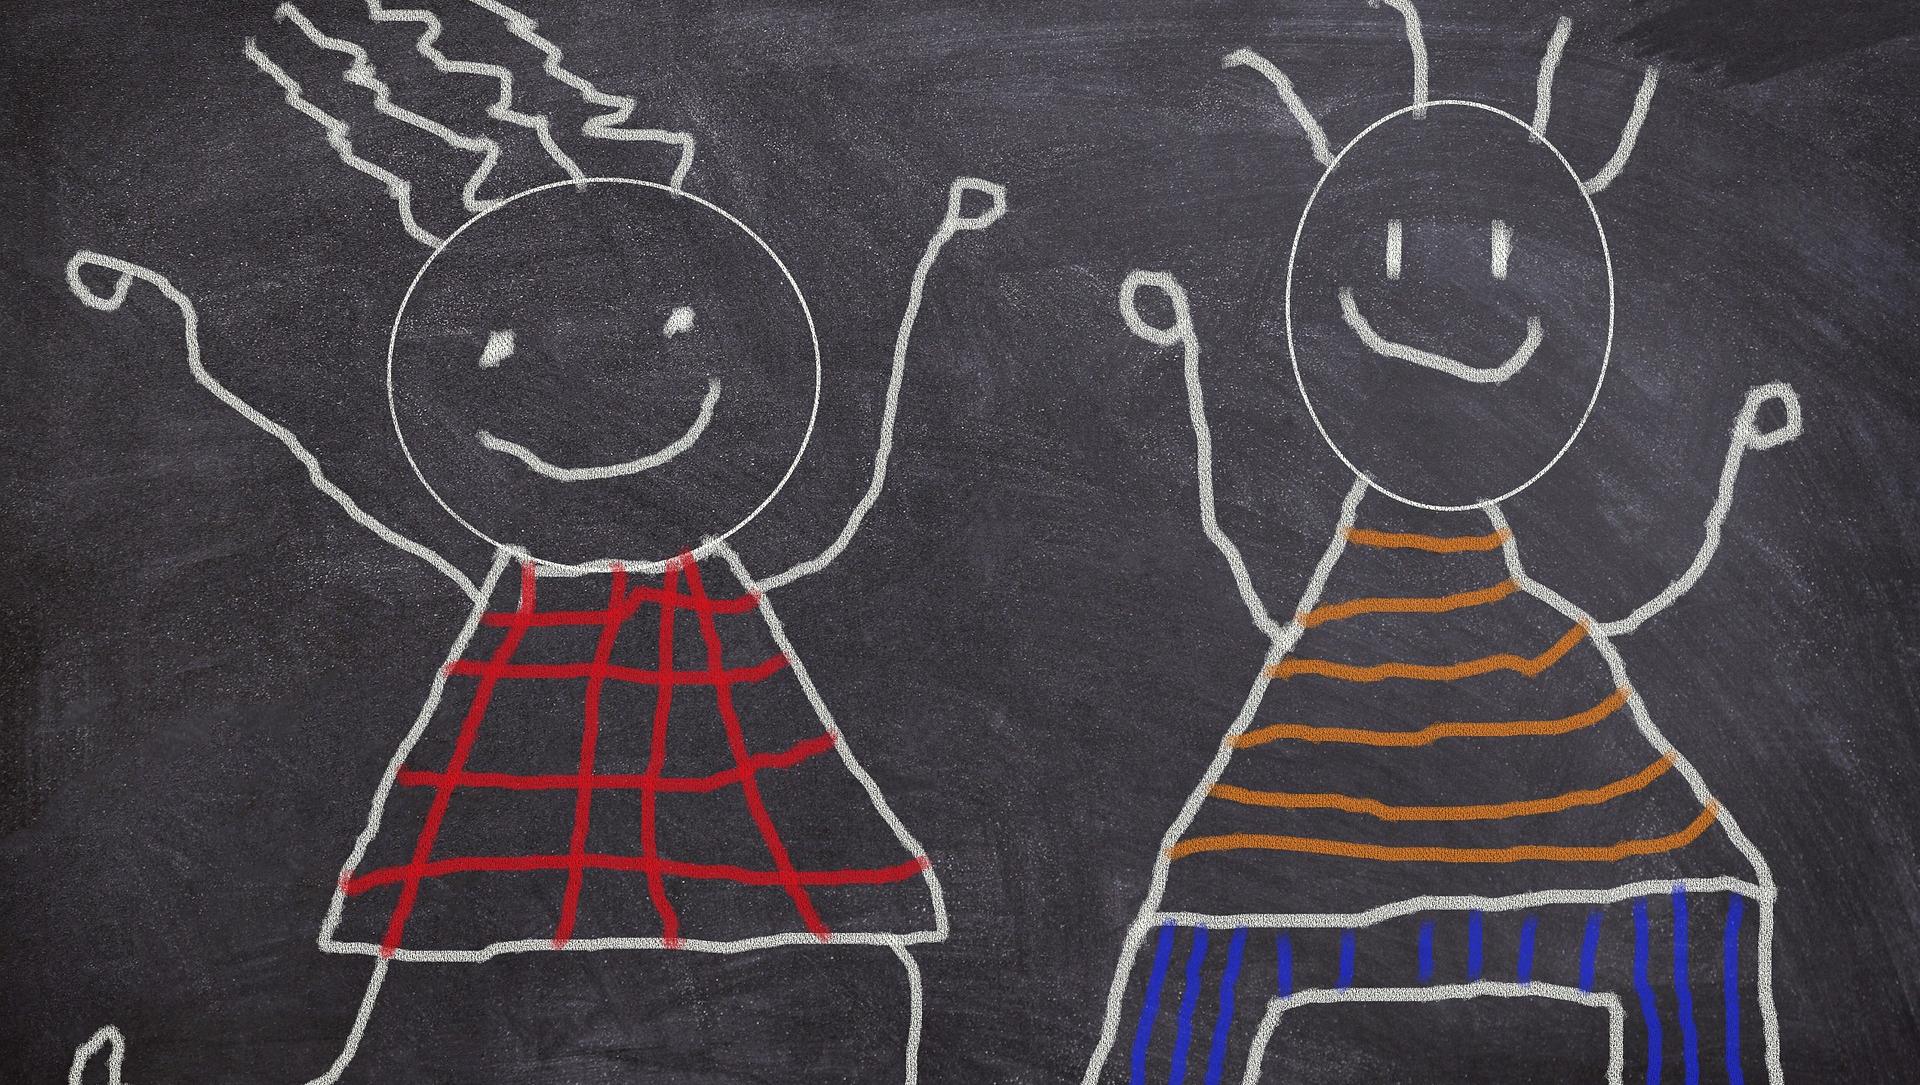 cartoon drawings of child figures on a blackboard